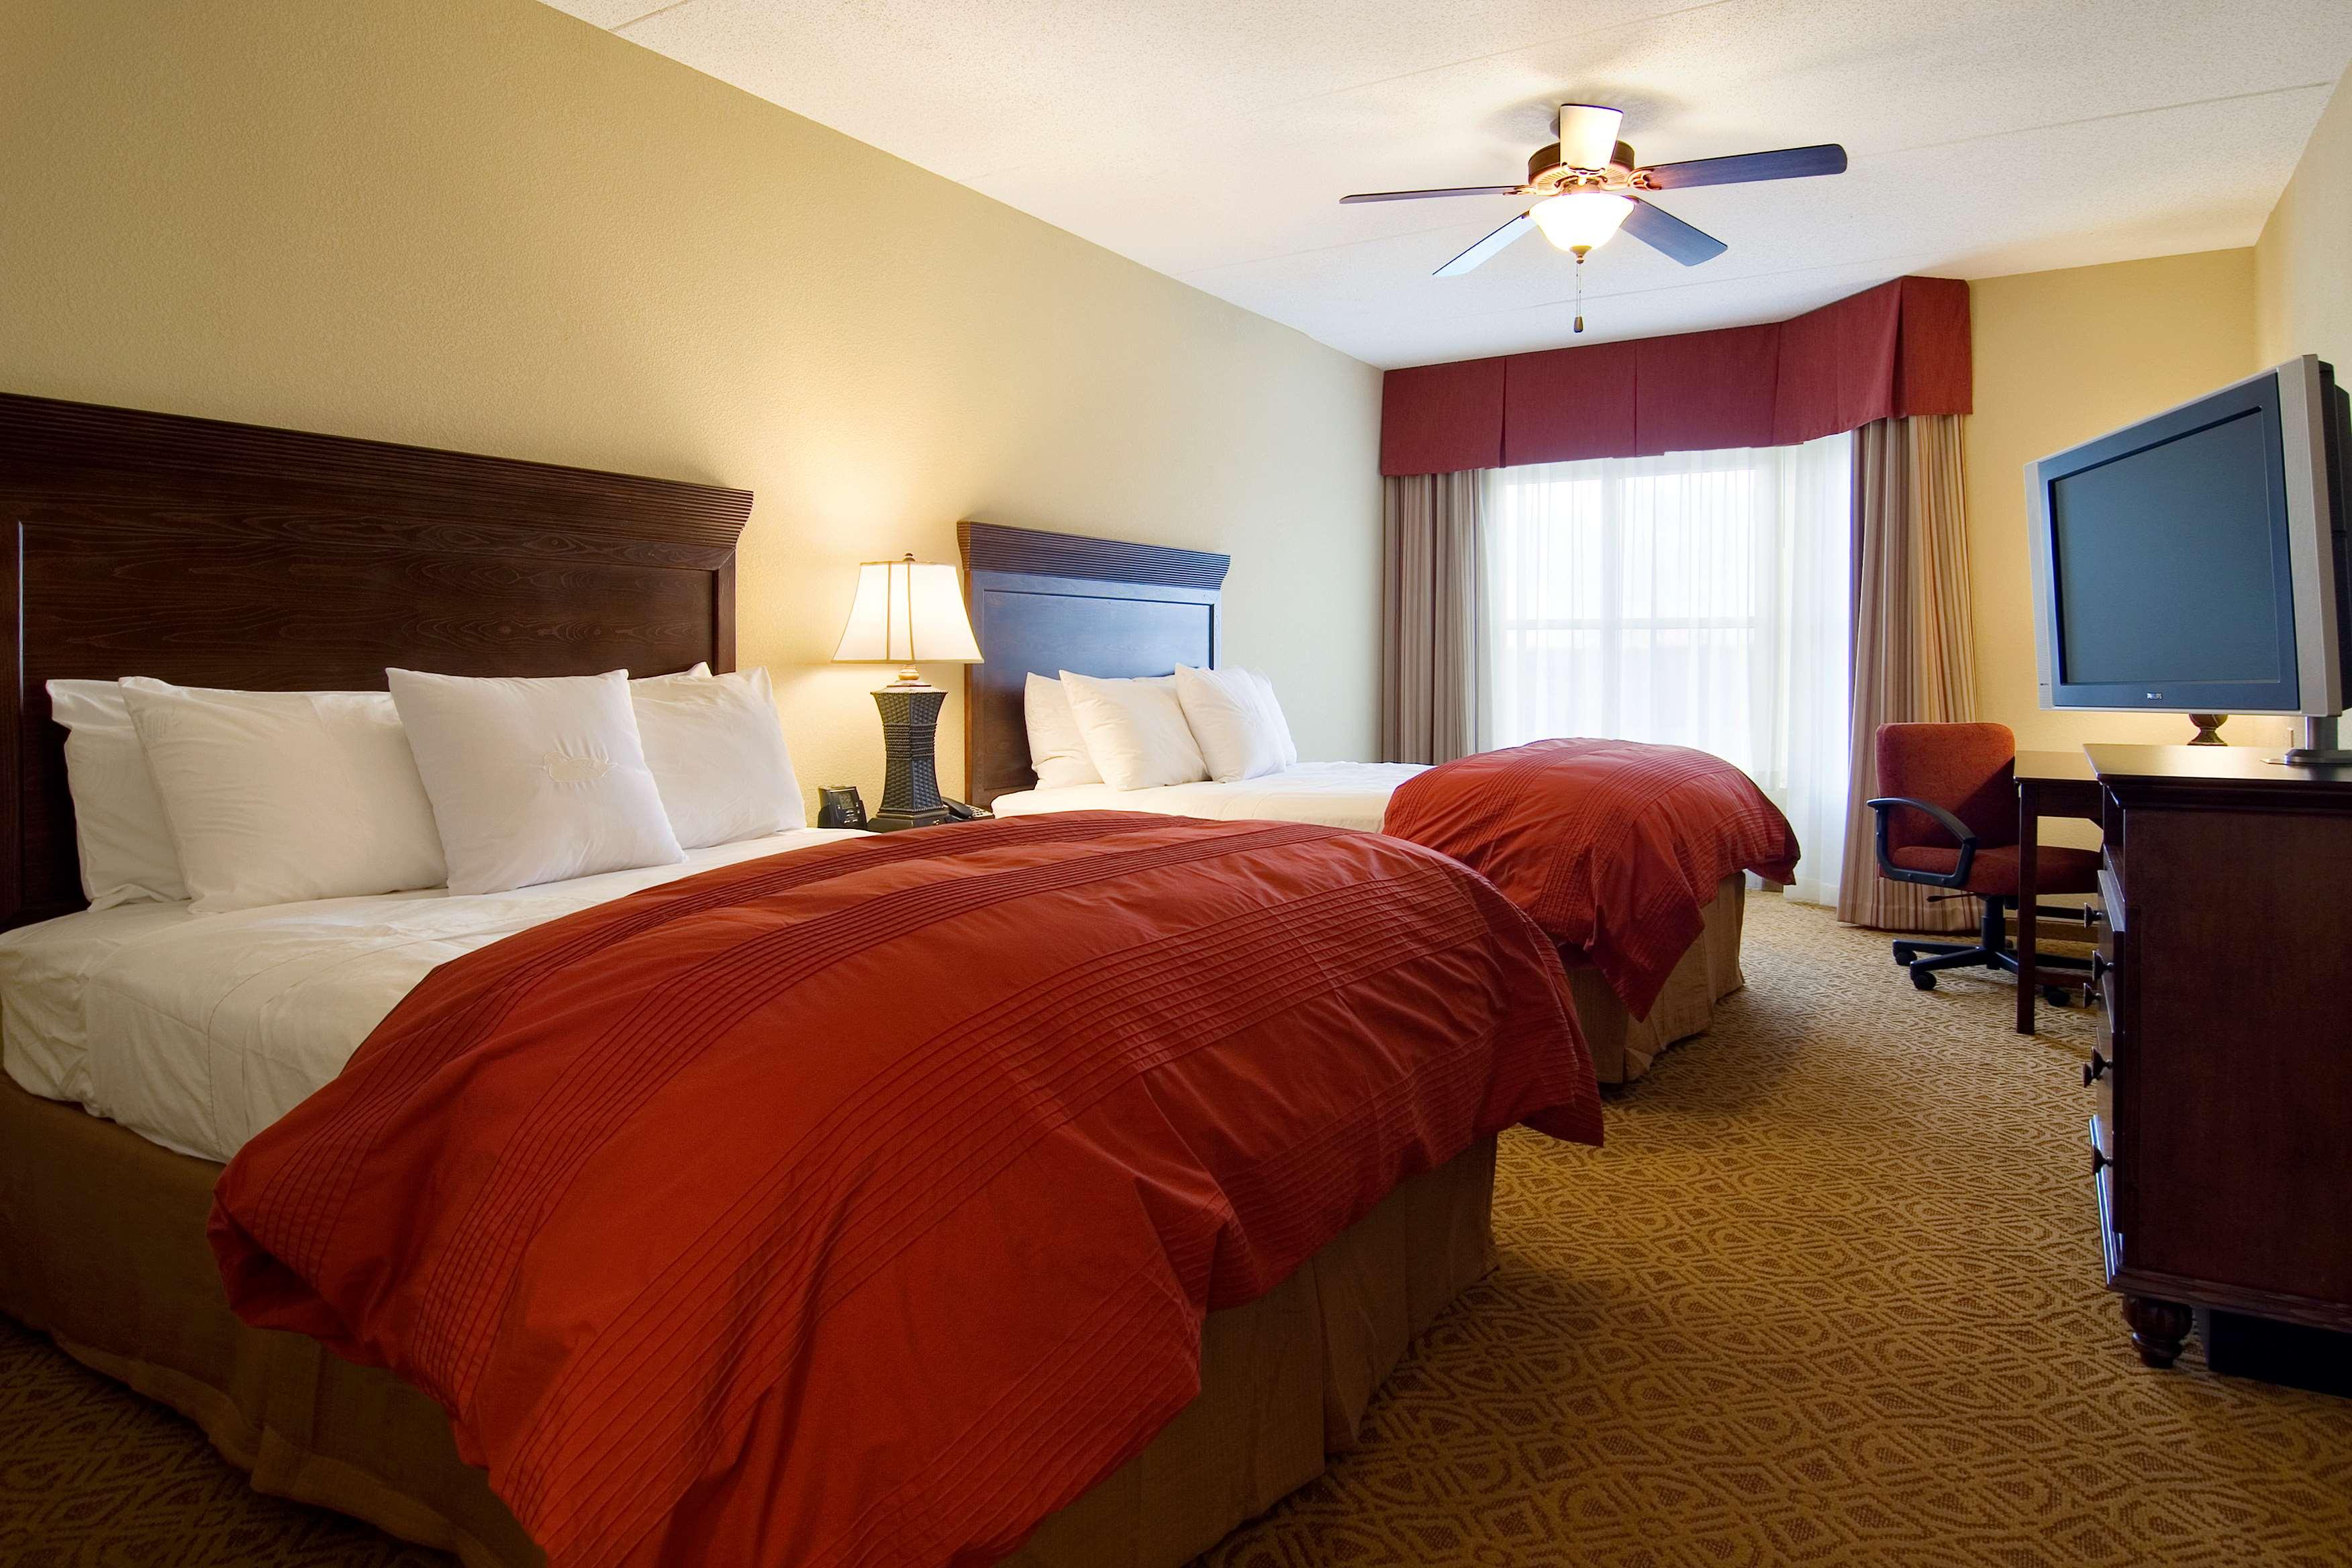 Homewood Suites by Hilton Fredericksburg image 17